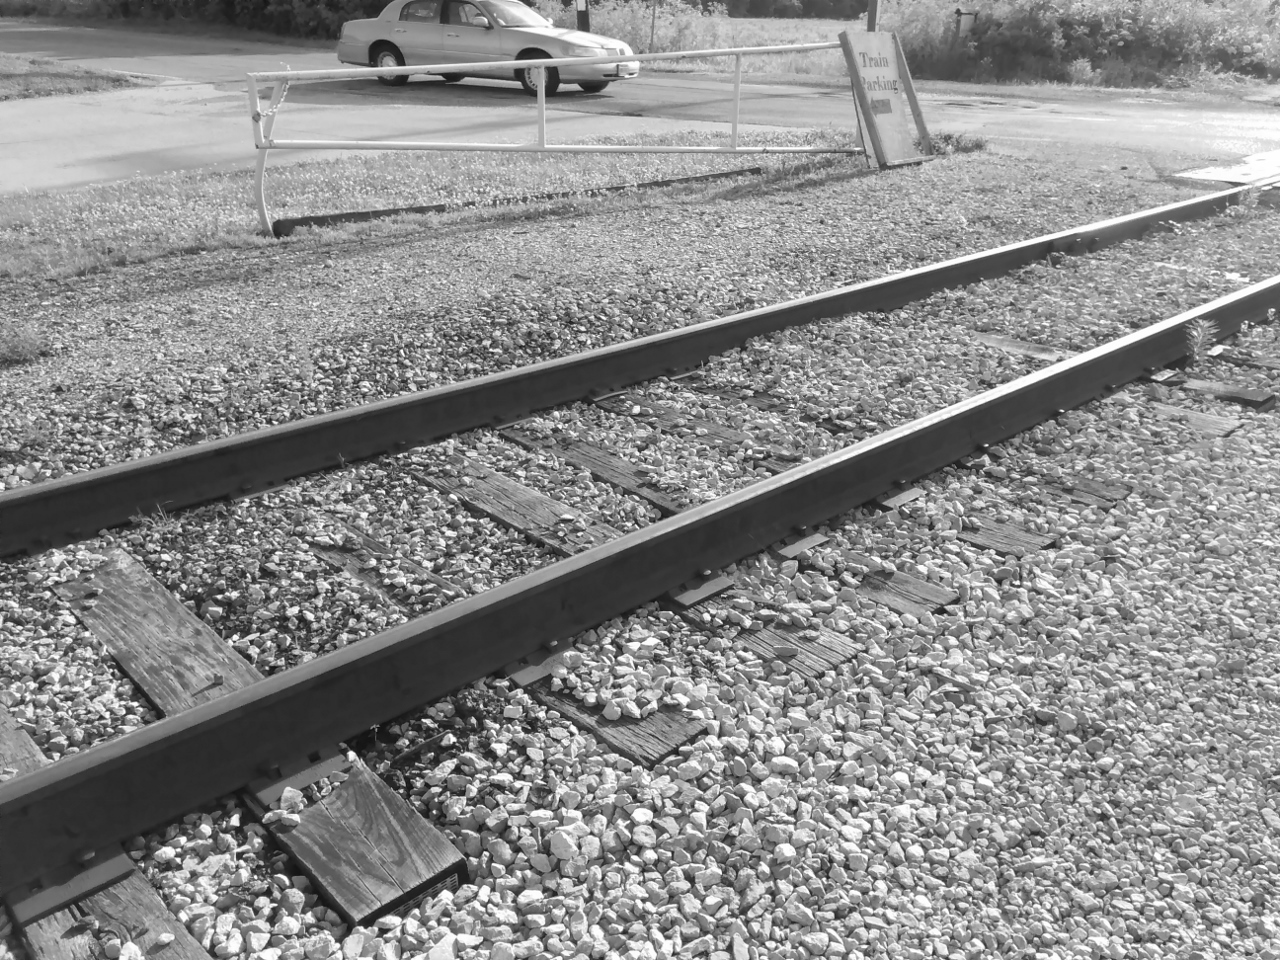 Hocking Valley Scenic Railway - BW 6-14-2018 6-40-28 PM